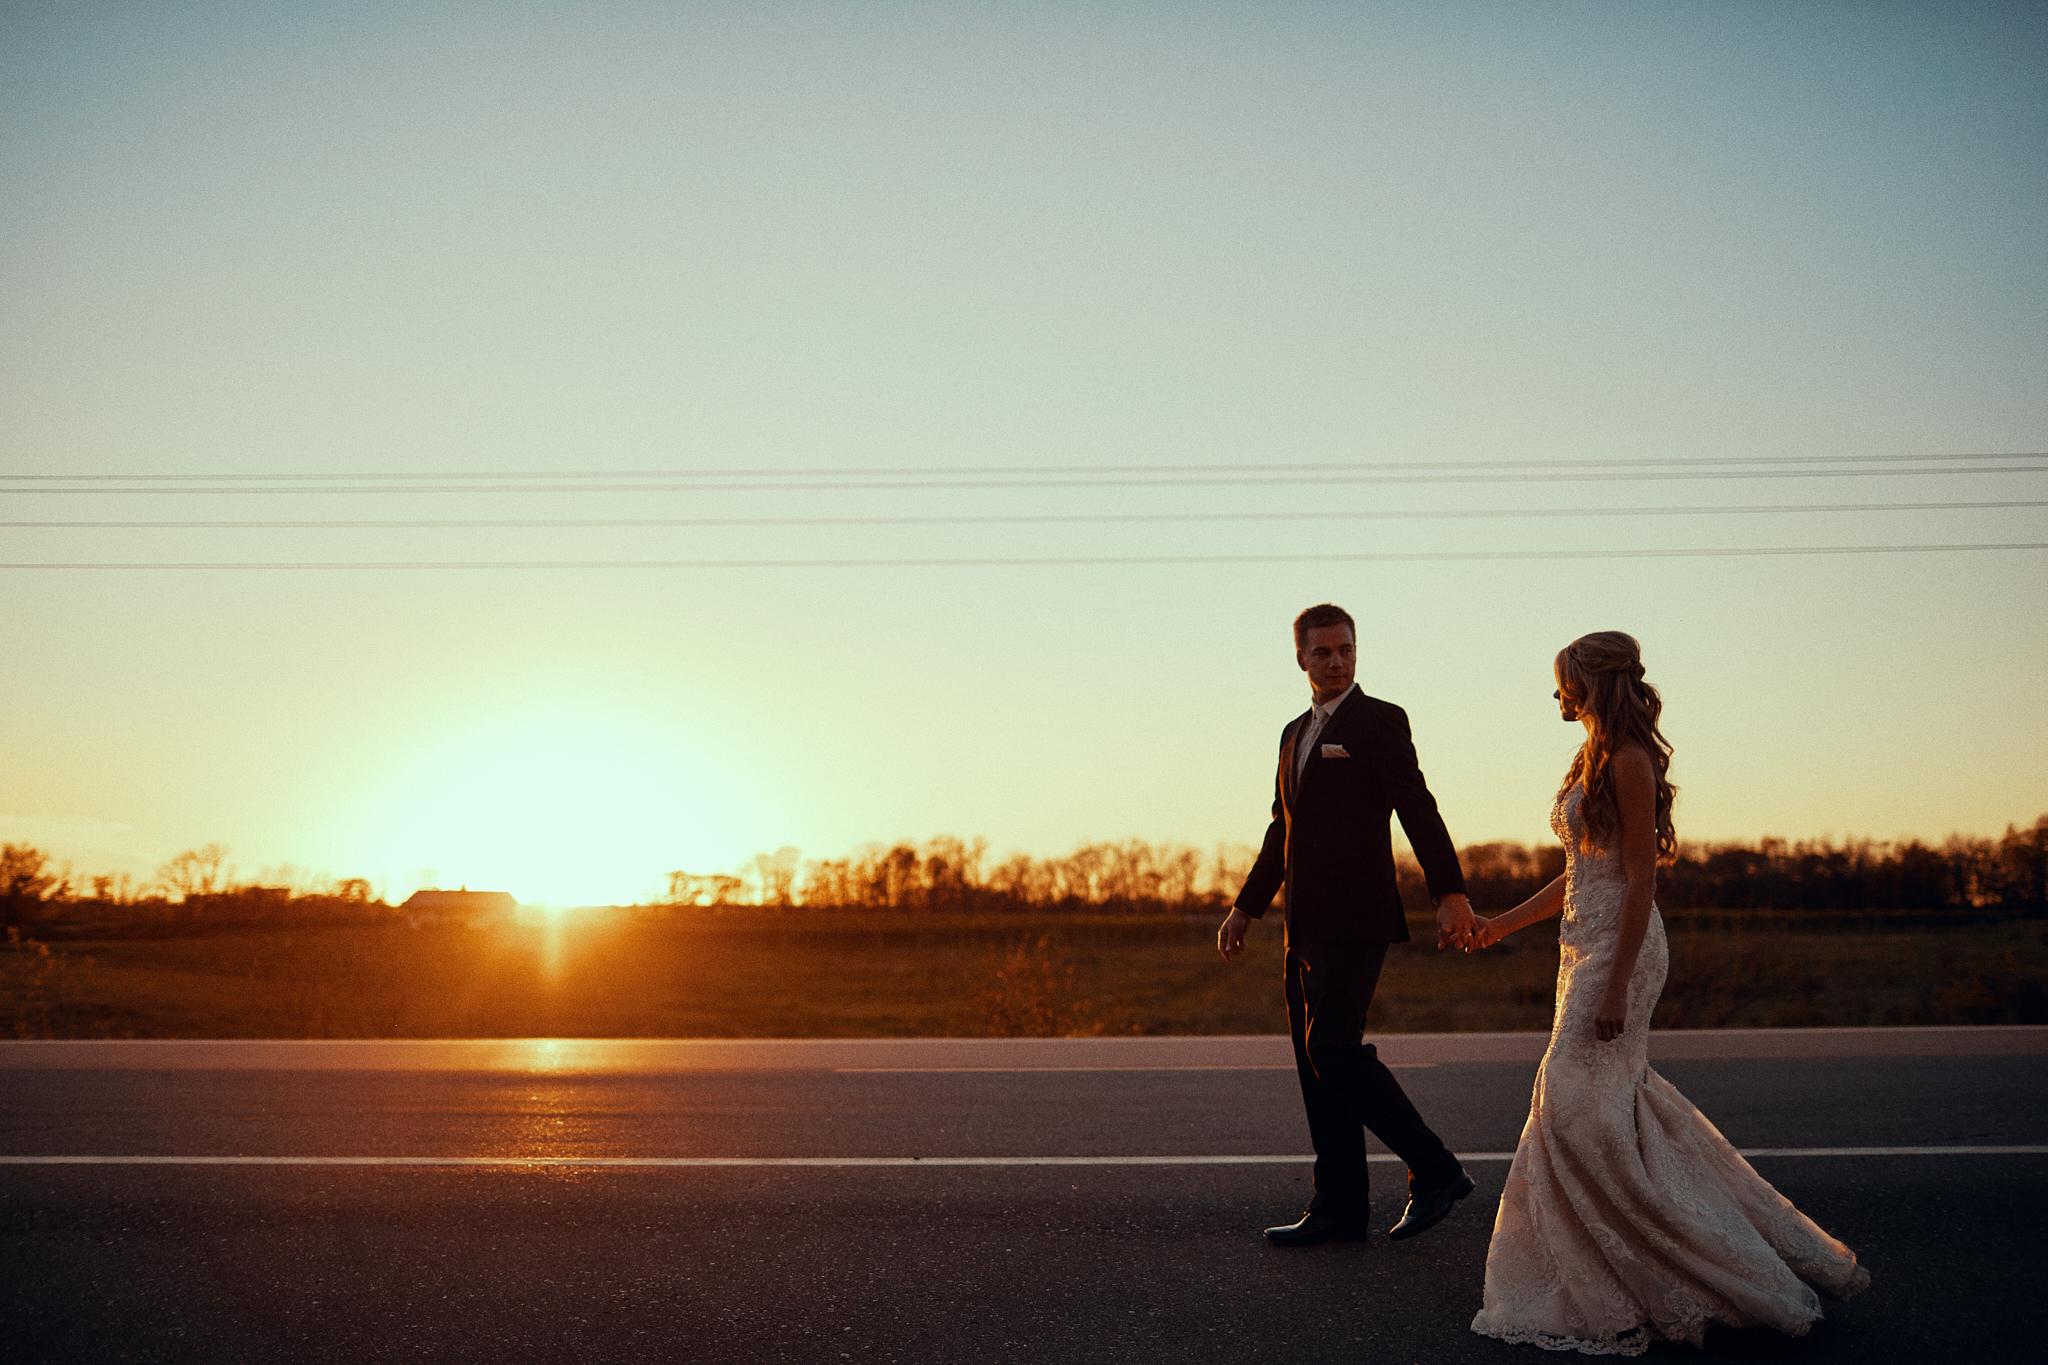 Killer_Field_Golden_Hour_Shot_In_Alexandria_Wedding_Photography_High_End_Minneapolis_Brand_Photographer_Something_Candid_023.JPG